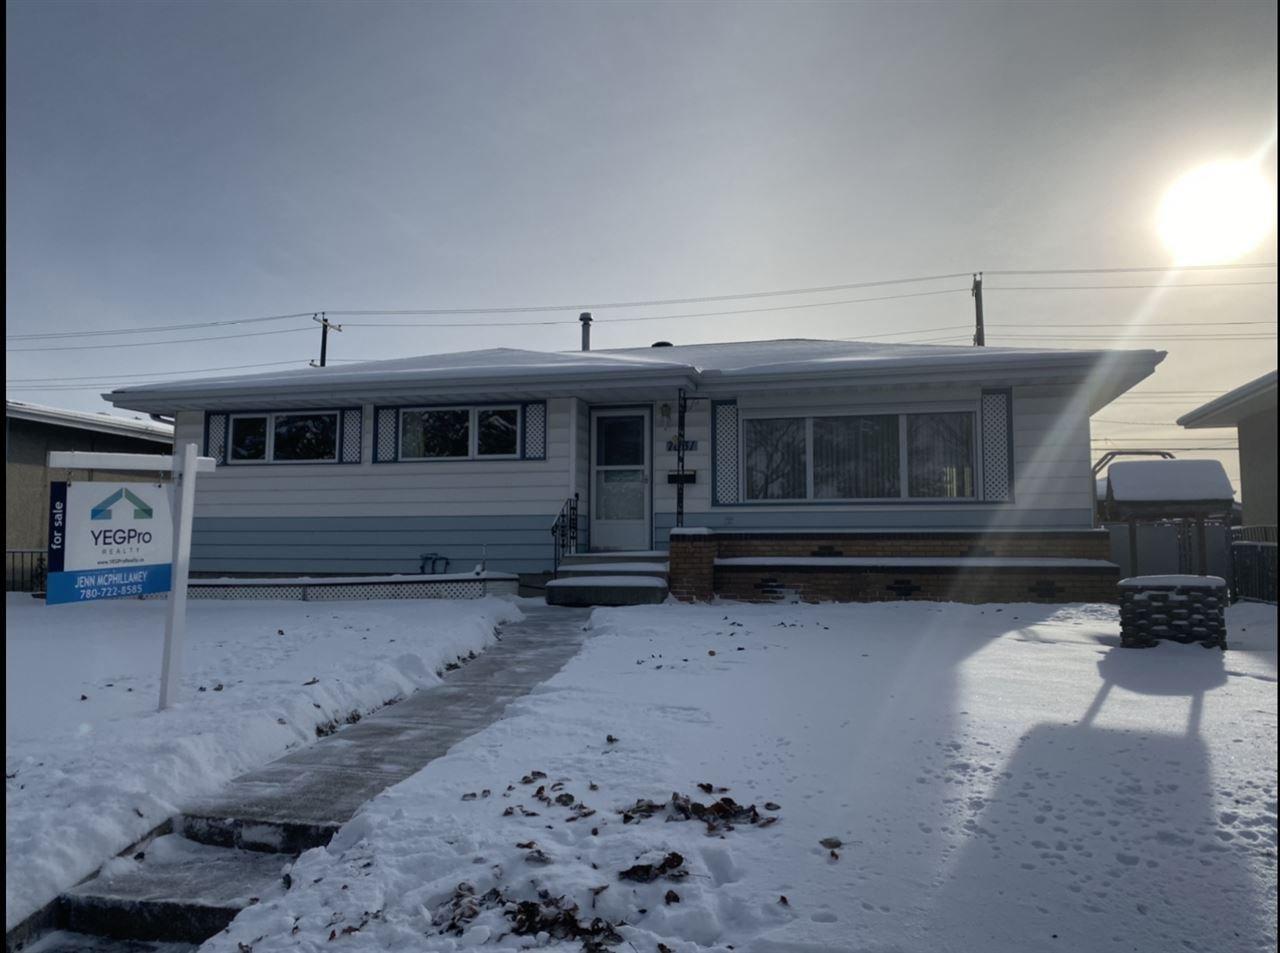 Main Photo: 7031 137 Avenue in Edmonton: Zone 02 House for sale : MLS®# E4181503